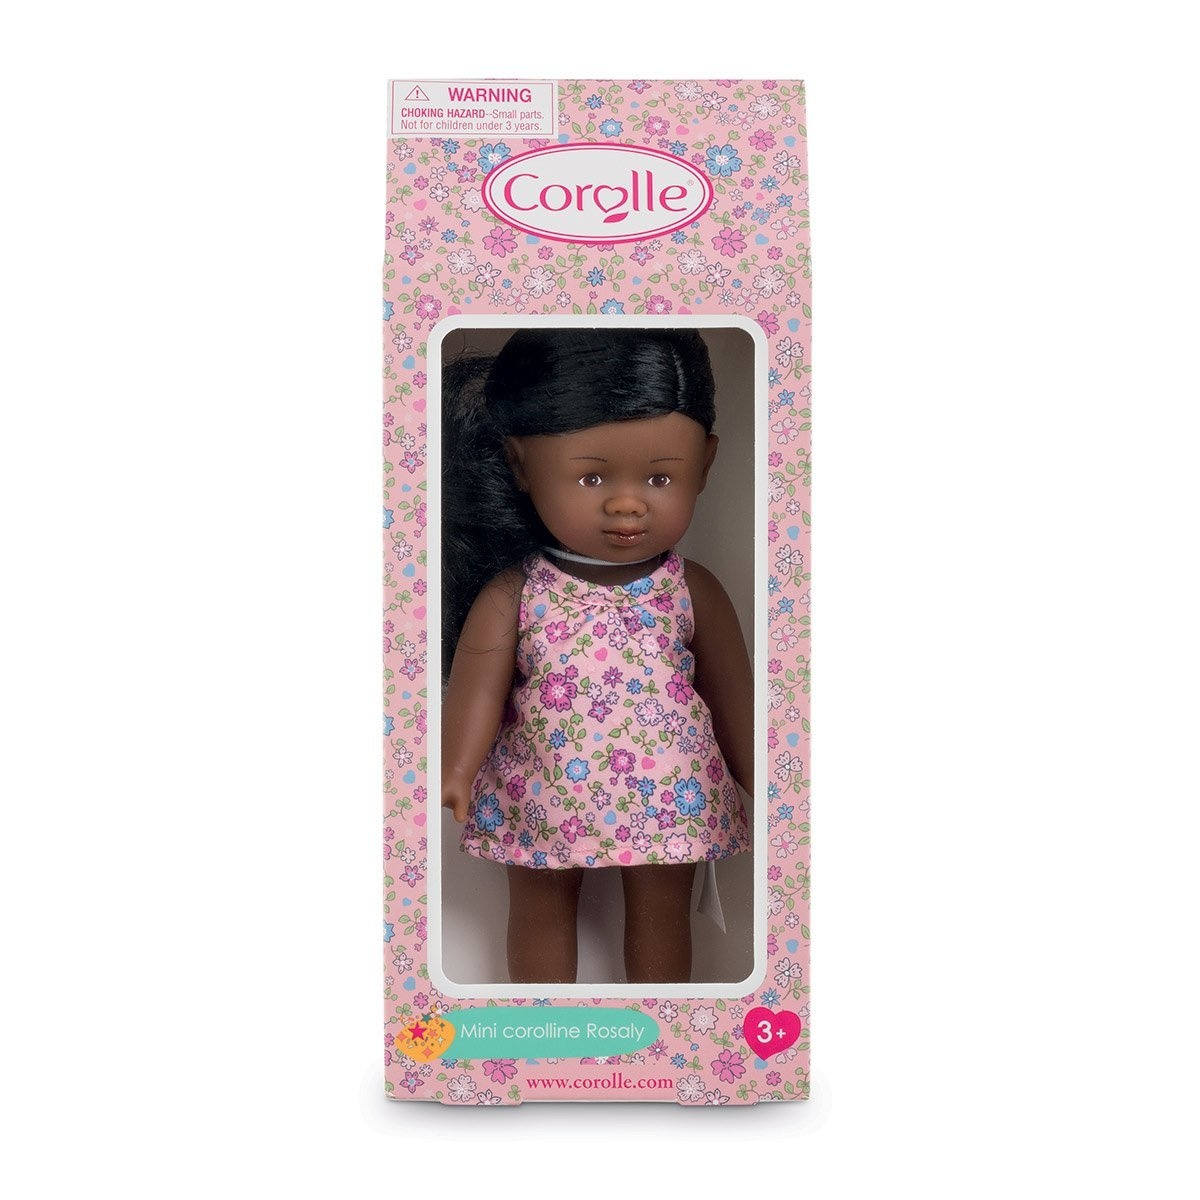 Corolle corolle mini poupée rosaly